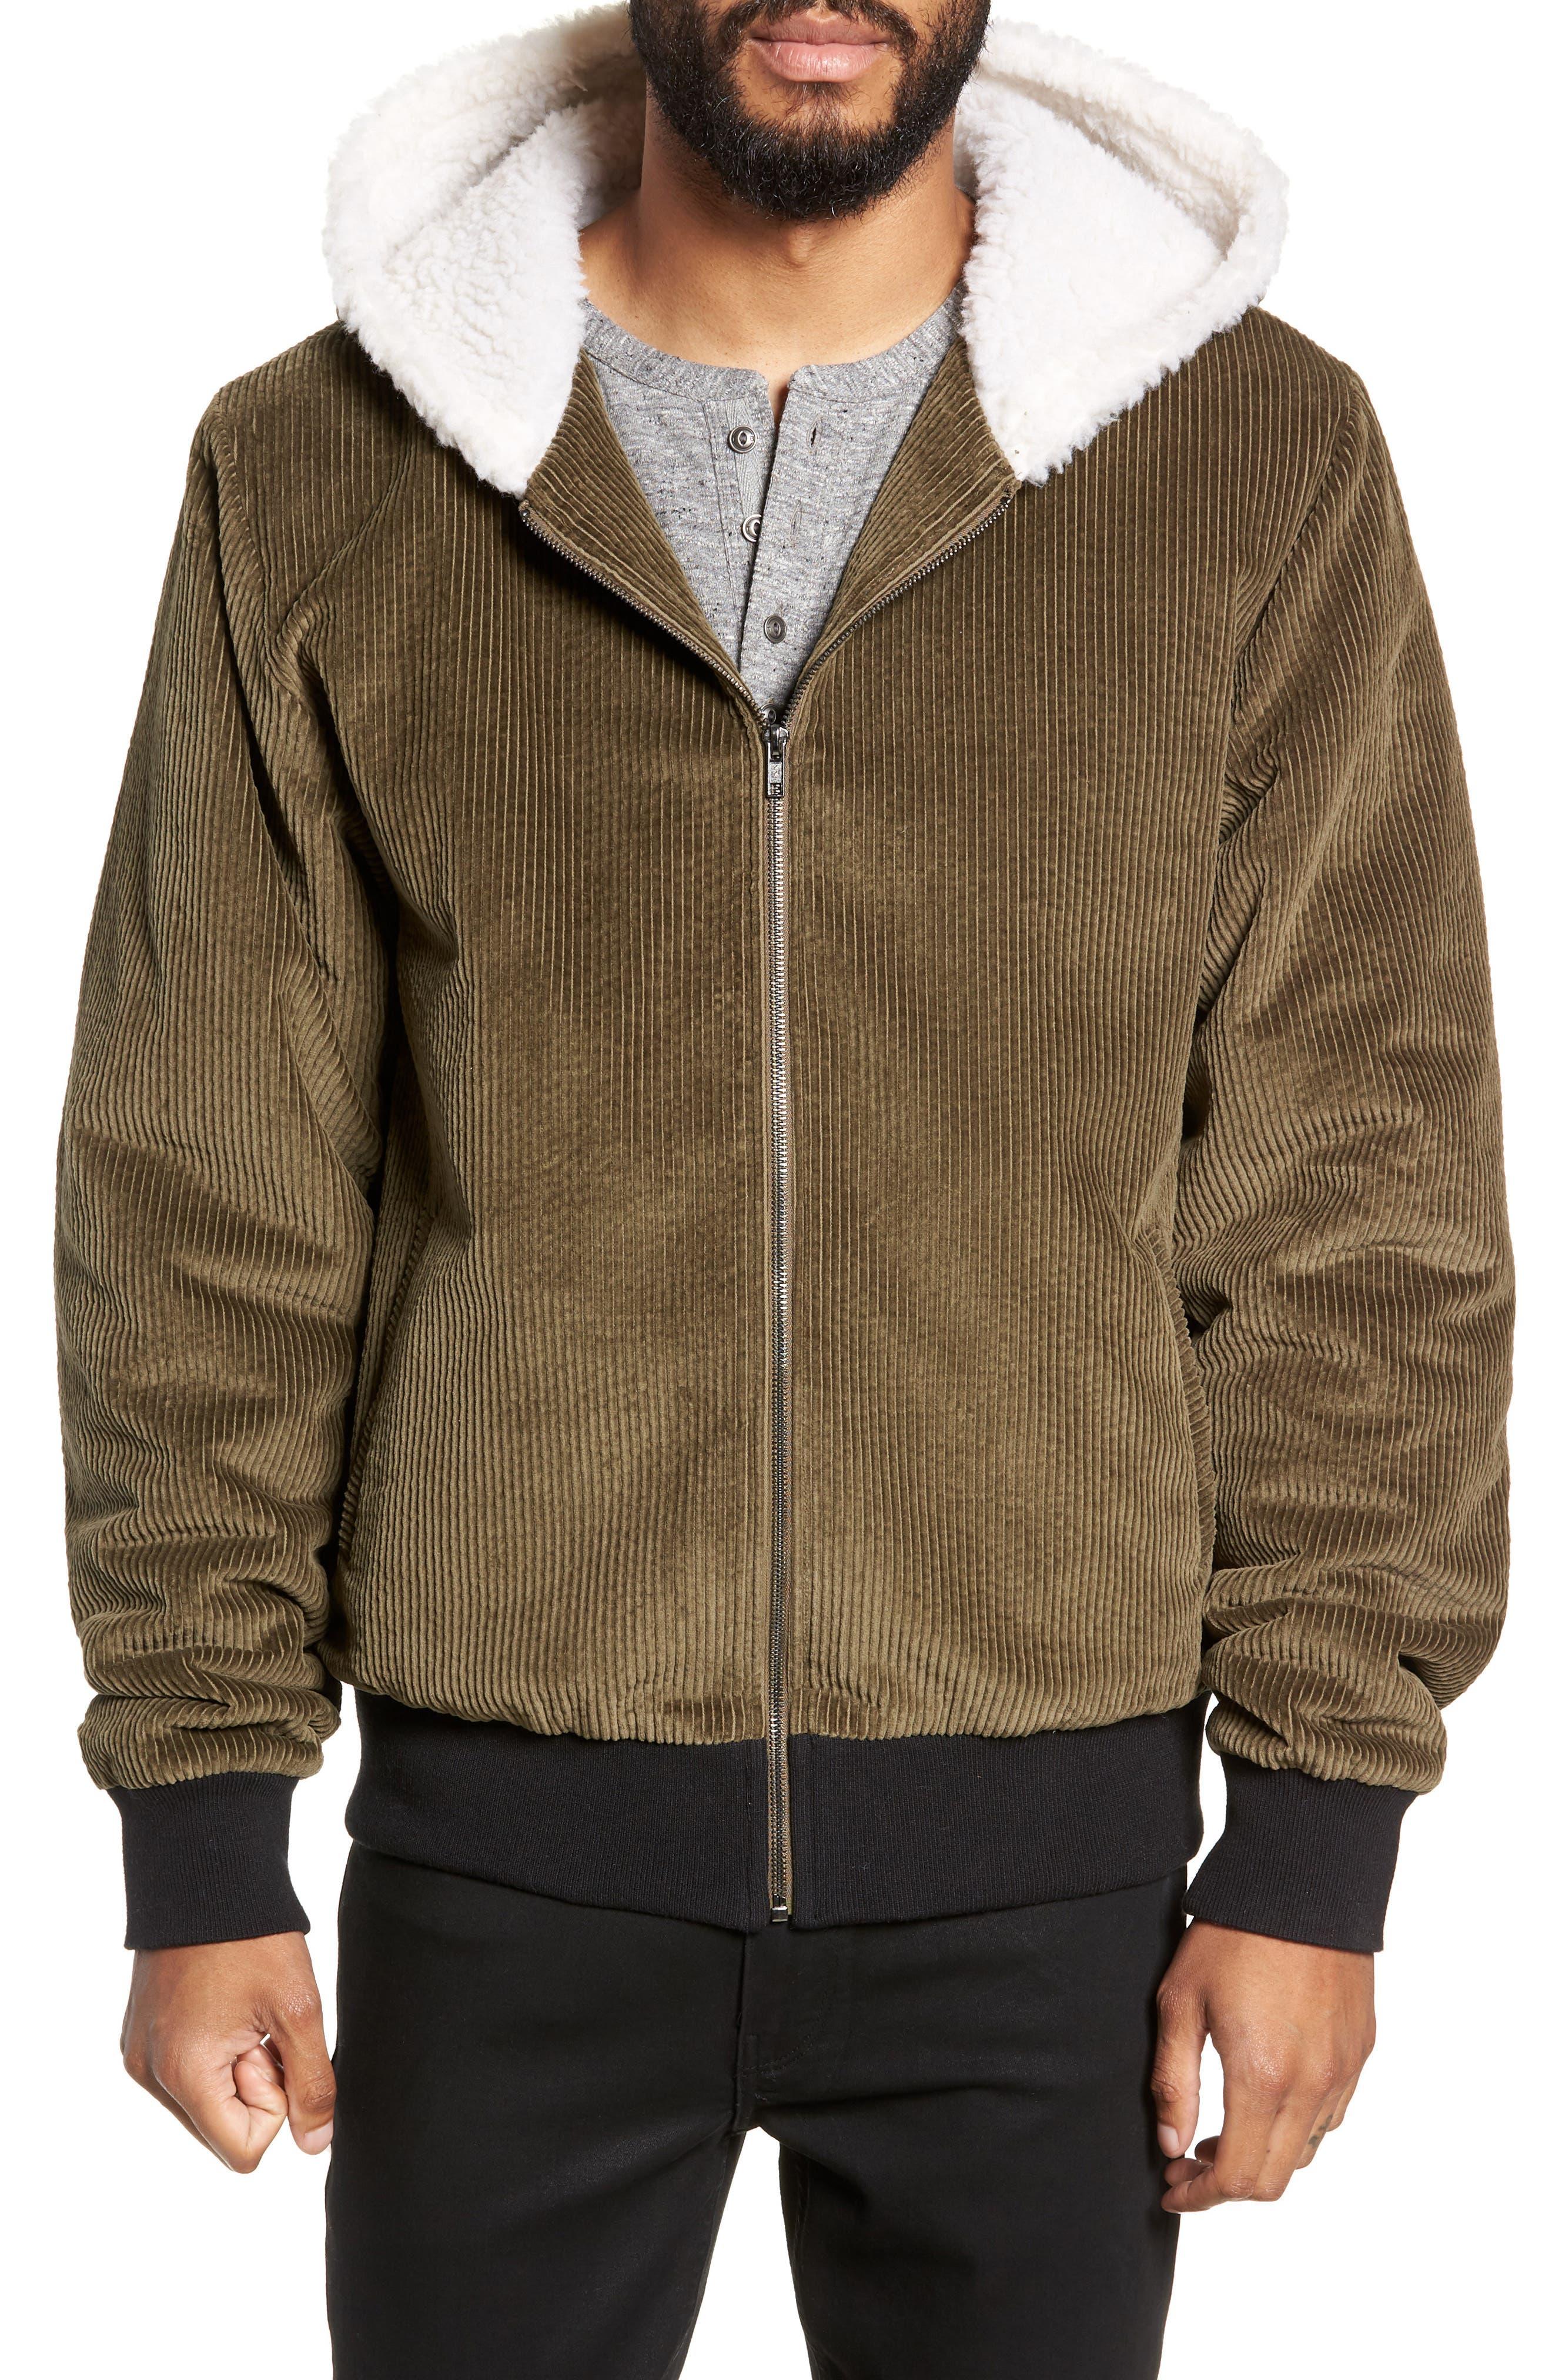 Champlain Cotton Corduroy & Faux Shearling Hooded Bomber Jacket,                             Main thumbnail 1, color,                             ARMY